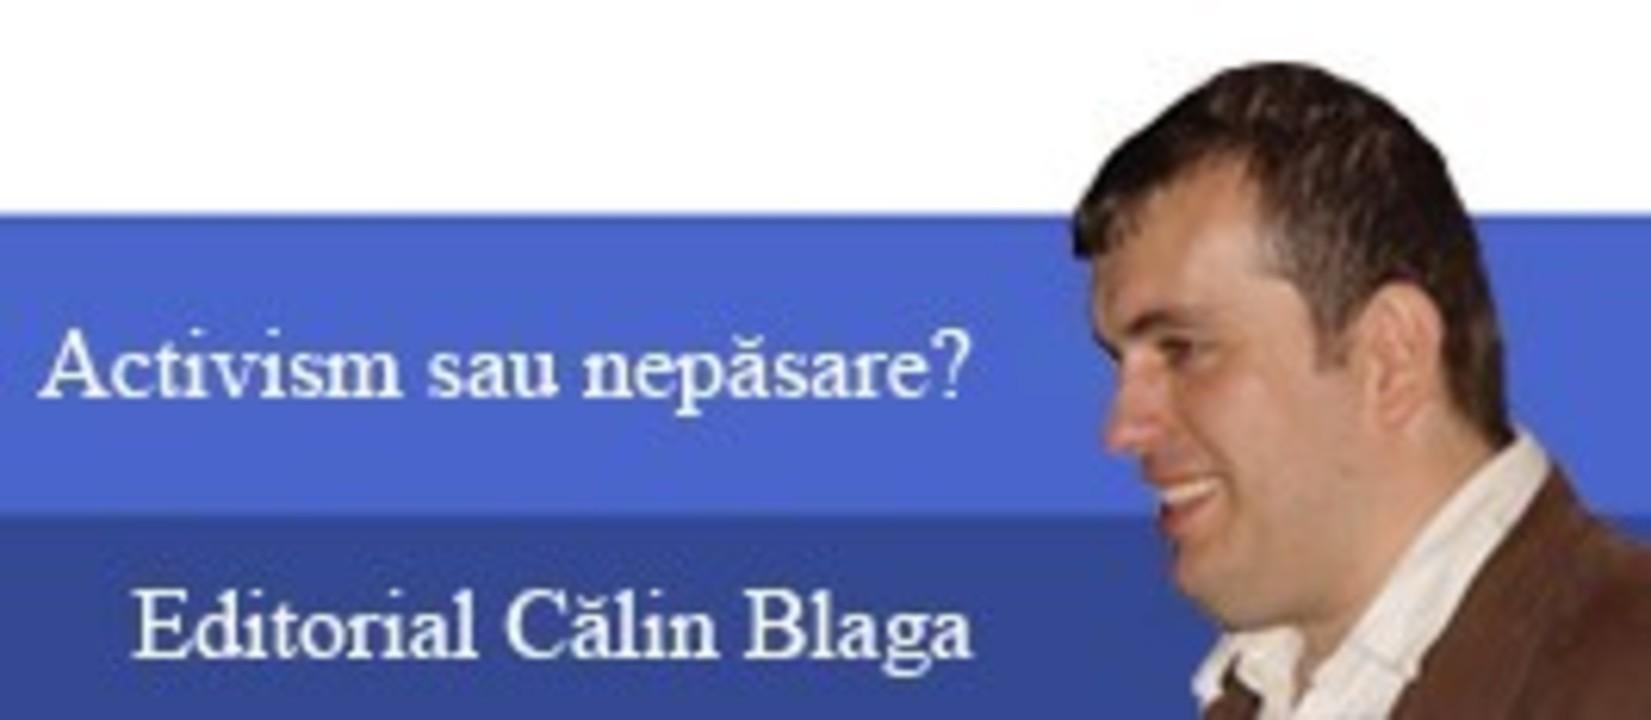 Editorialist la Sibiu7.com